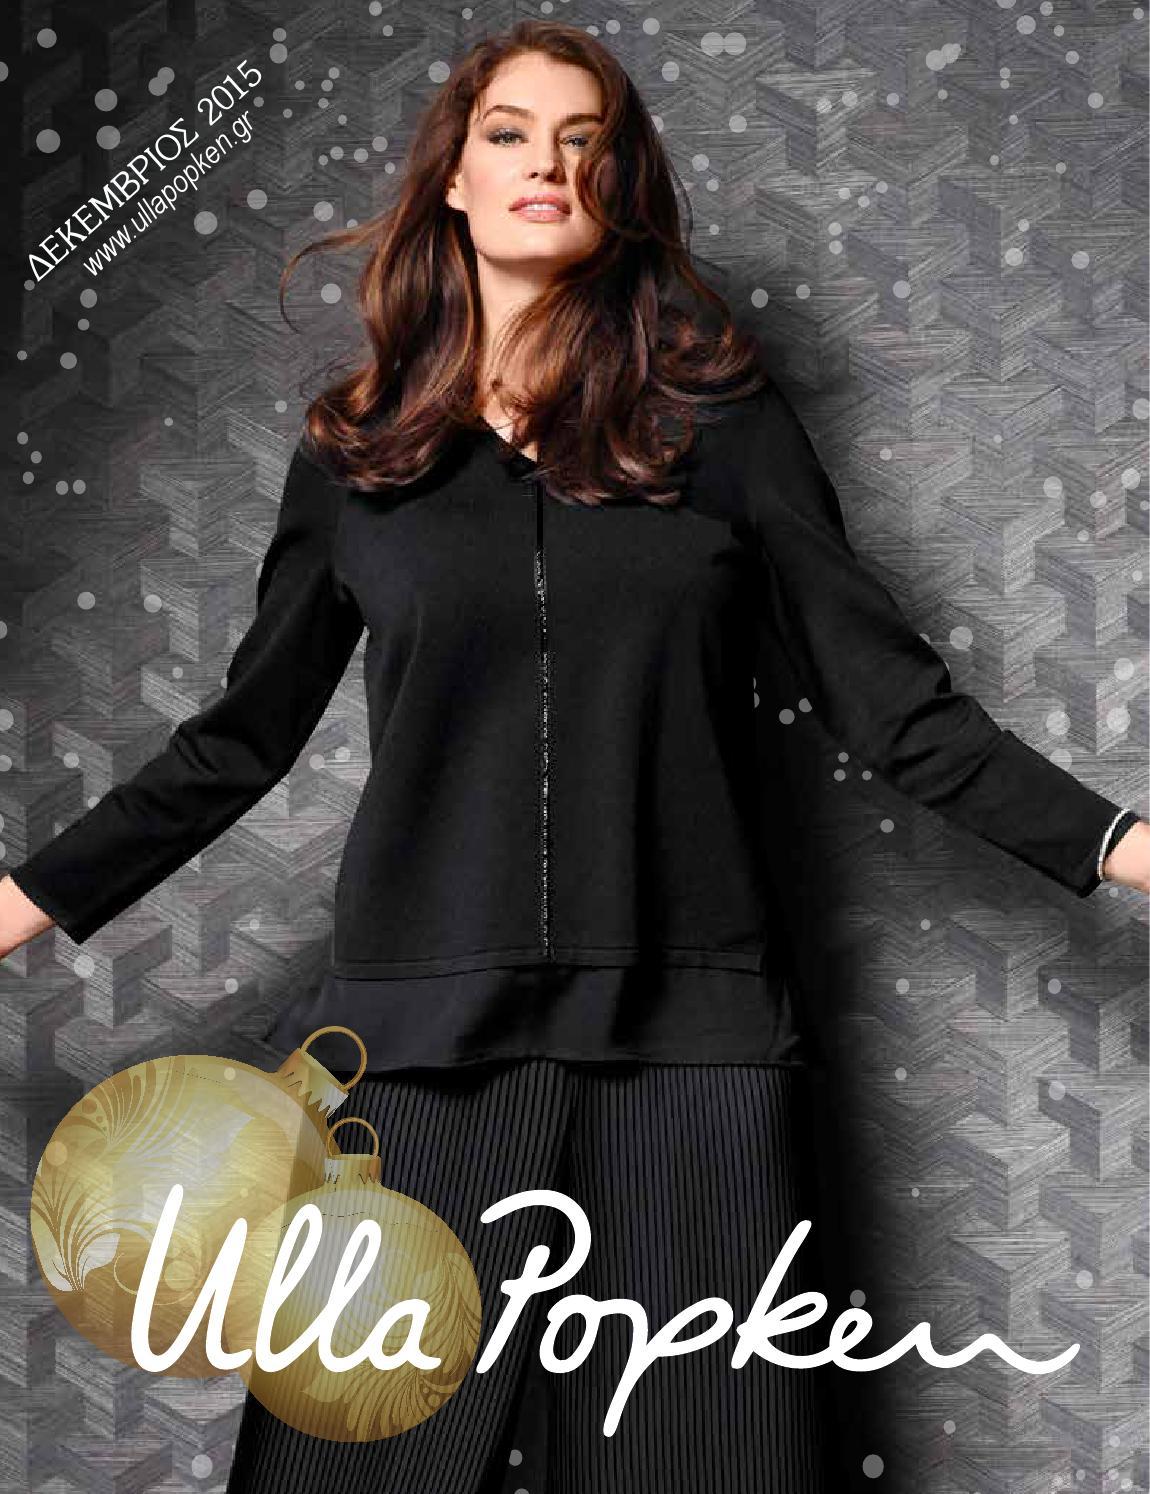 dcb9c9e8ca71 Ulla Popken December 2015 by Plus Size Fashion World - issuu